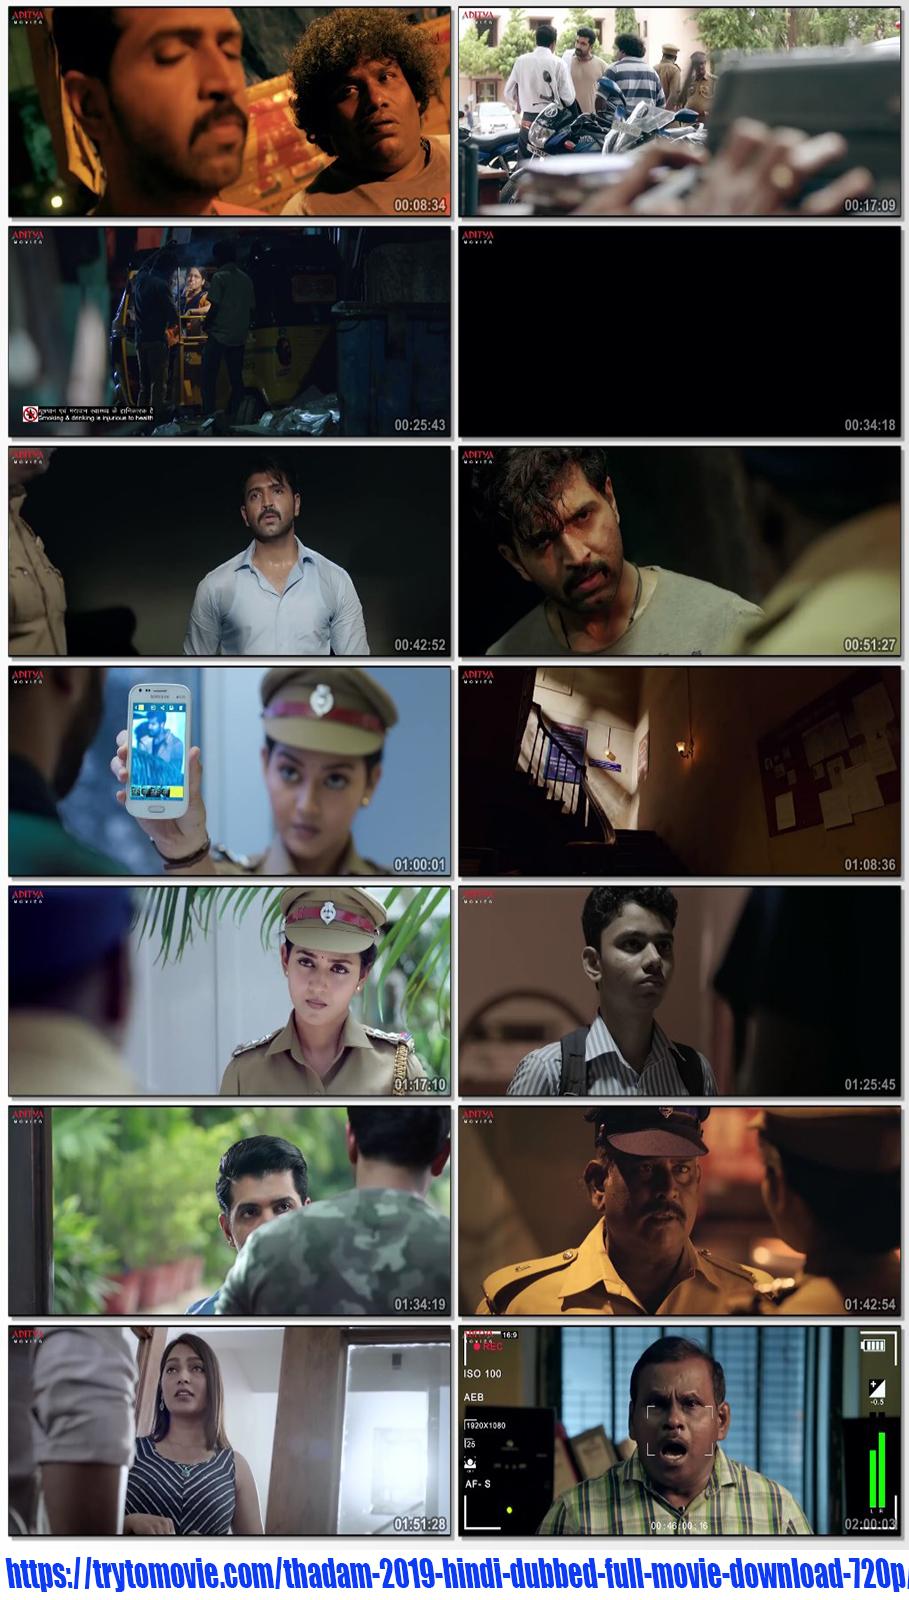 Thadam 2019 Hindi Dubbed Full Movie Download 720p